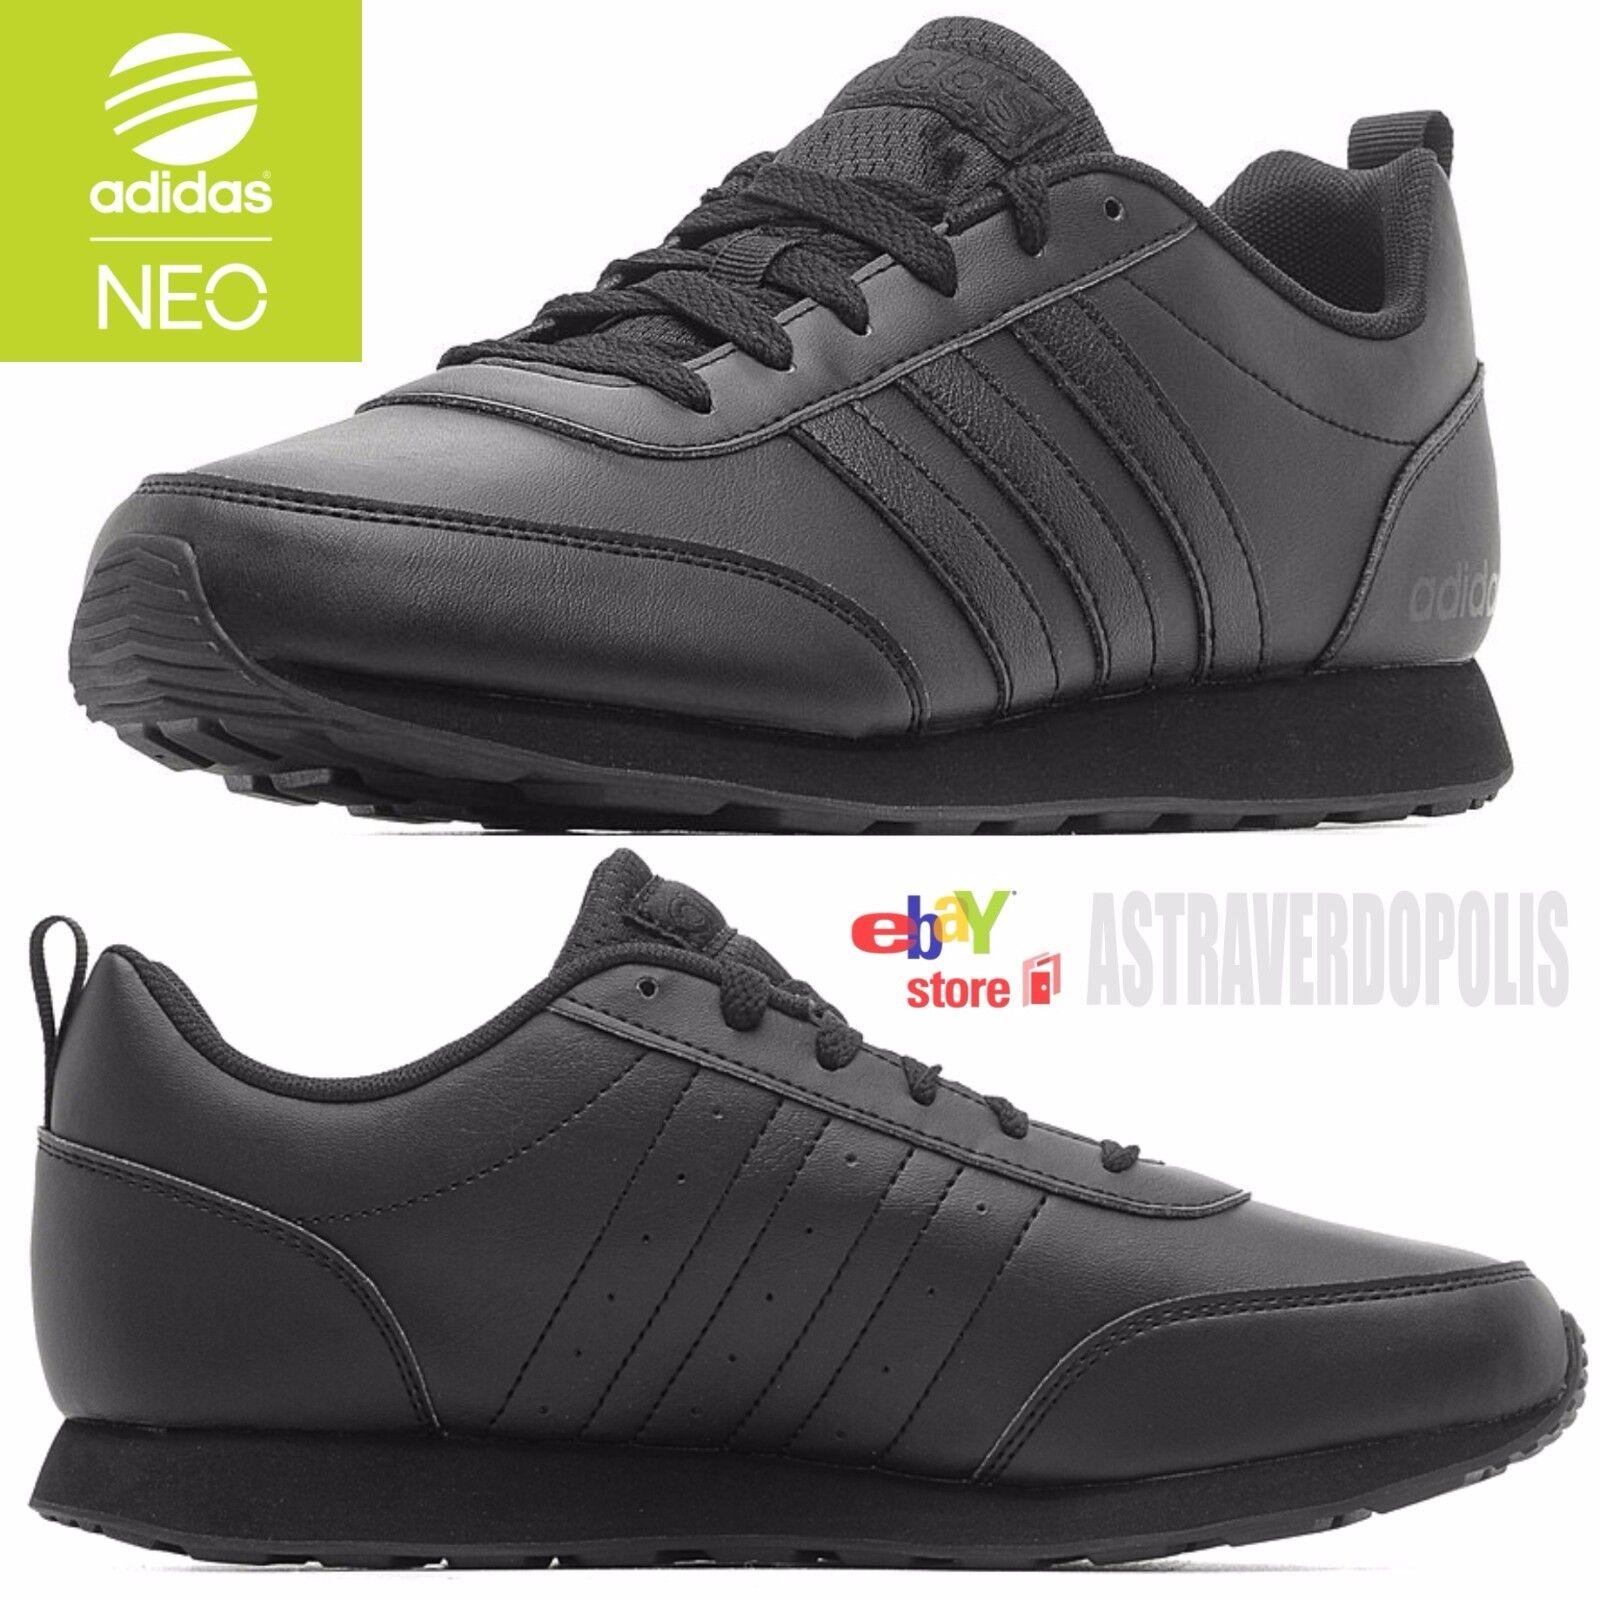 ADIDAS  MENS V RUN VS NEO ORIGINALI SUPERSTAR nero scarpe GAZELLE F98400 11.5 11  negozio online